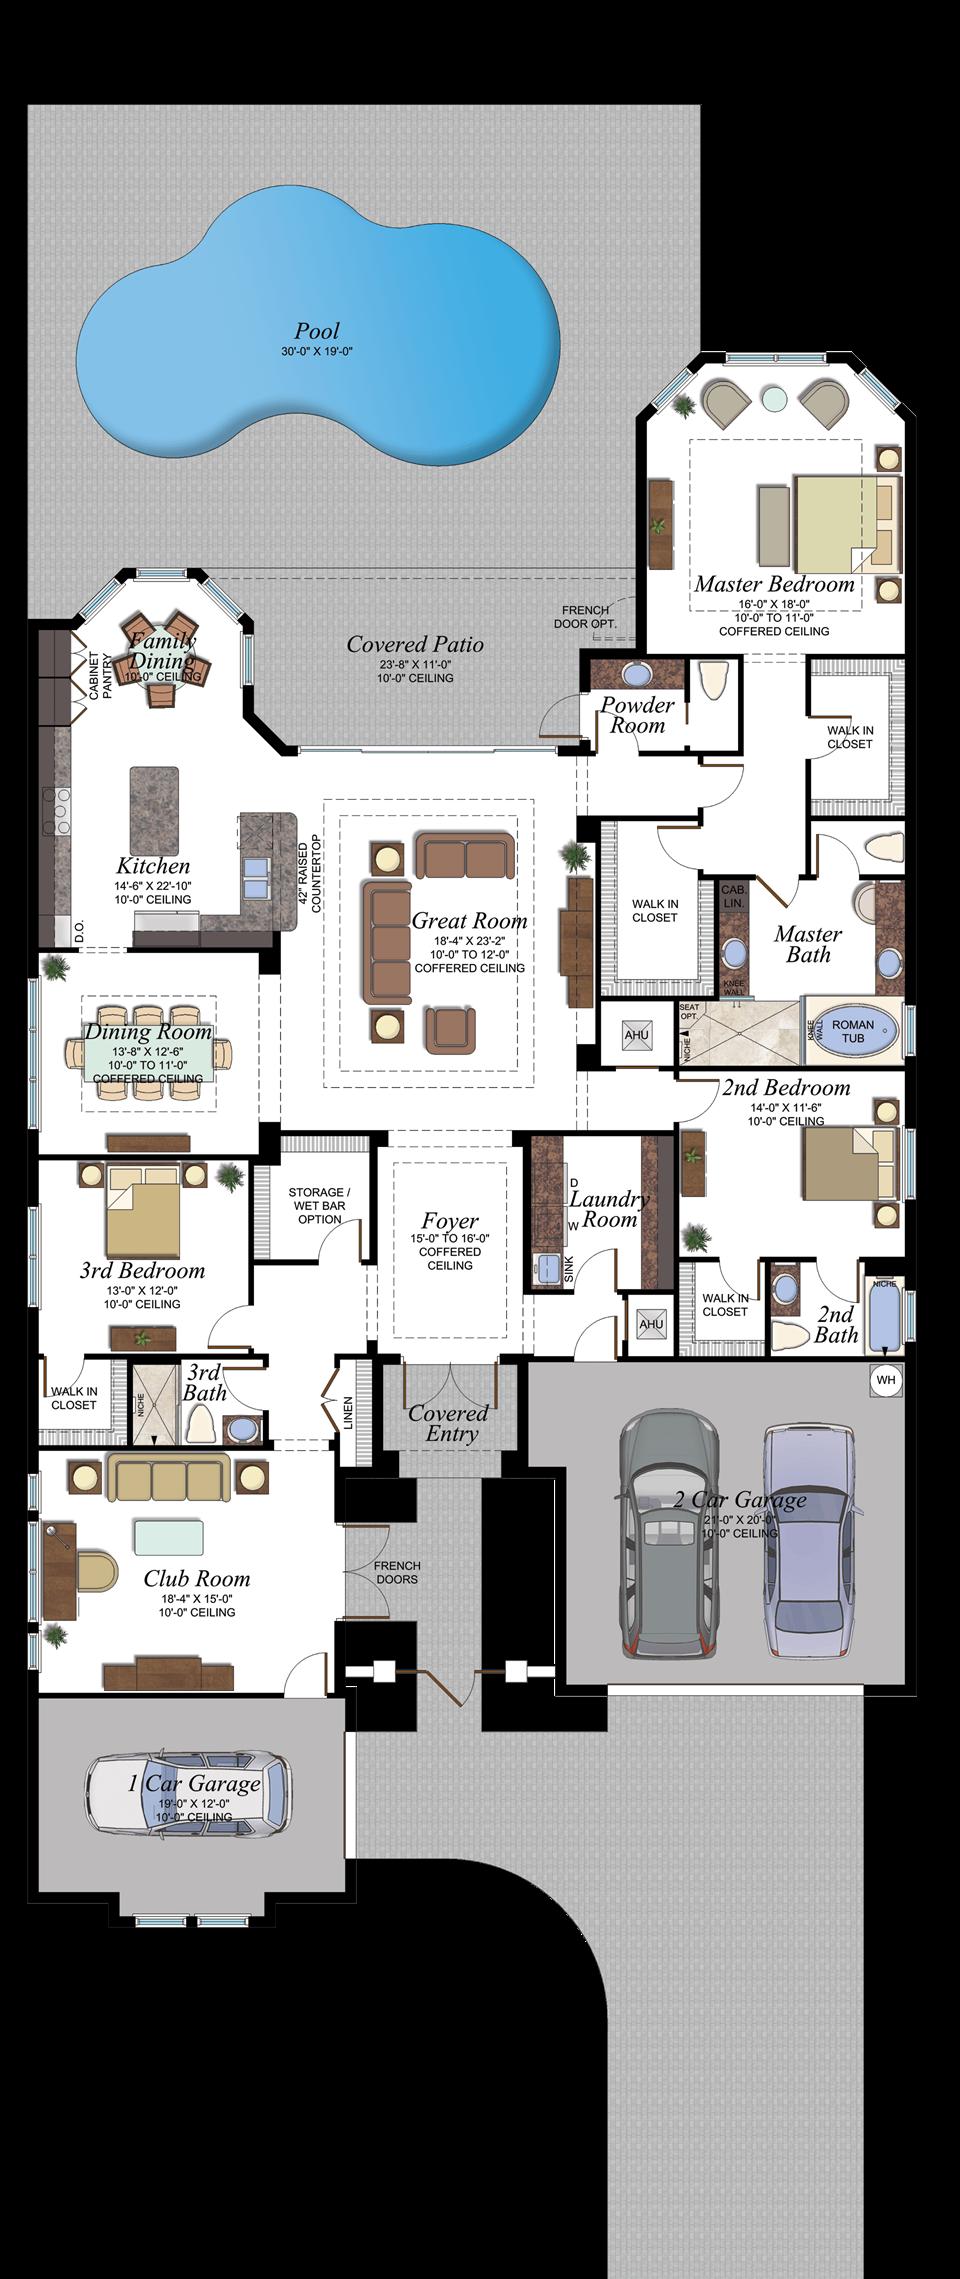 Berkeley Boca Carlyle Floorplan Mansion Plans South Florida Real Estate Florida Real Estate